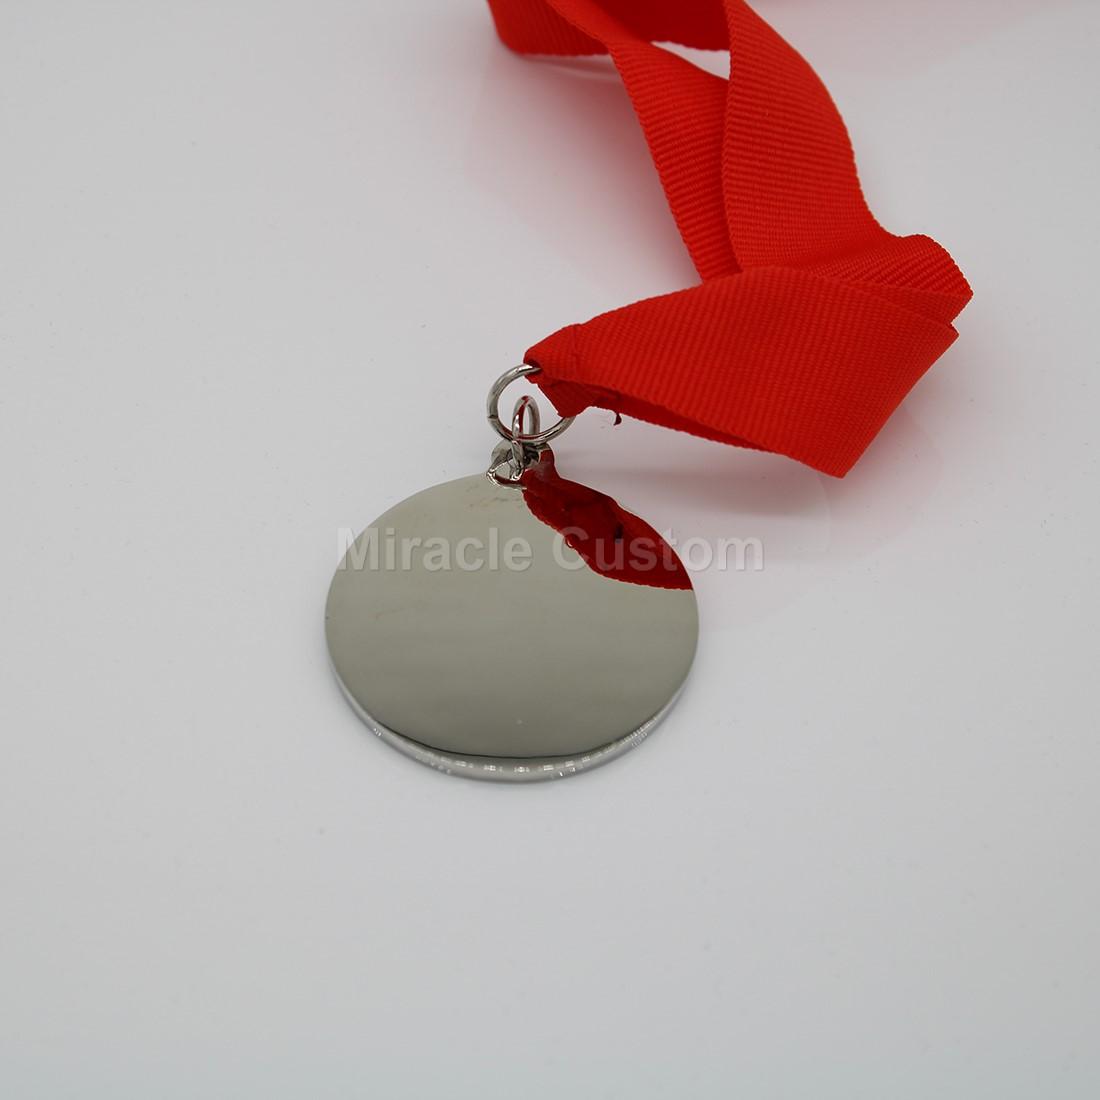 custom academy sports medals